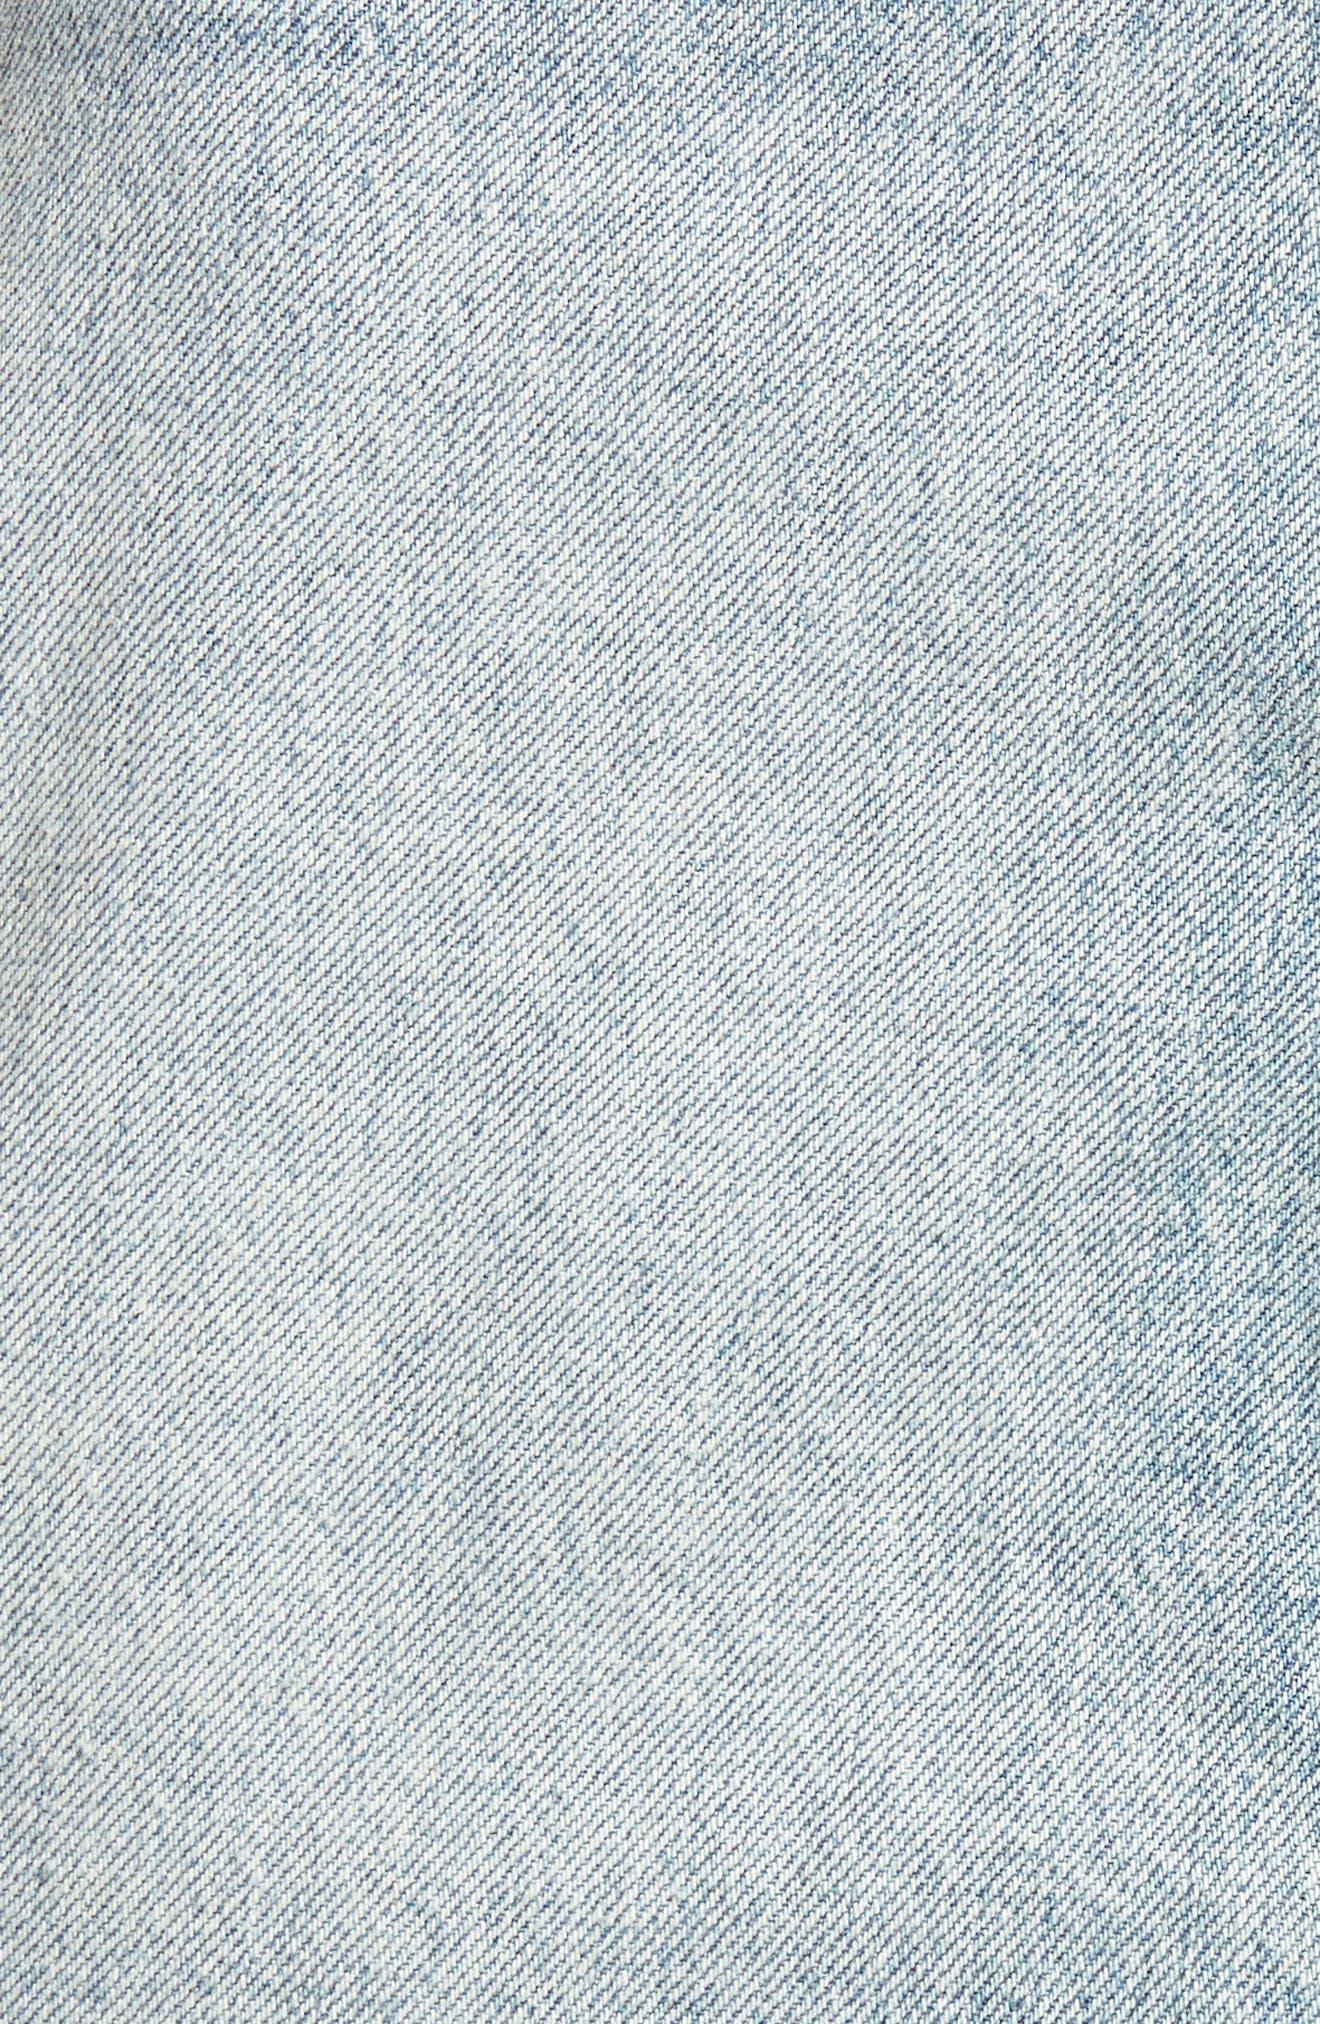 Vivid Cutoff Denim Miniskirt,                             Alternate thumbnail 6, color,                             453